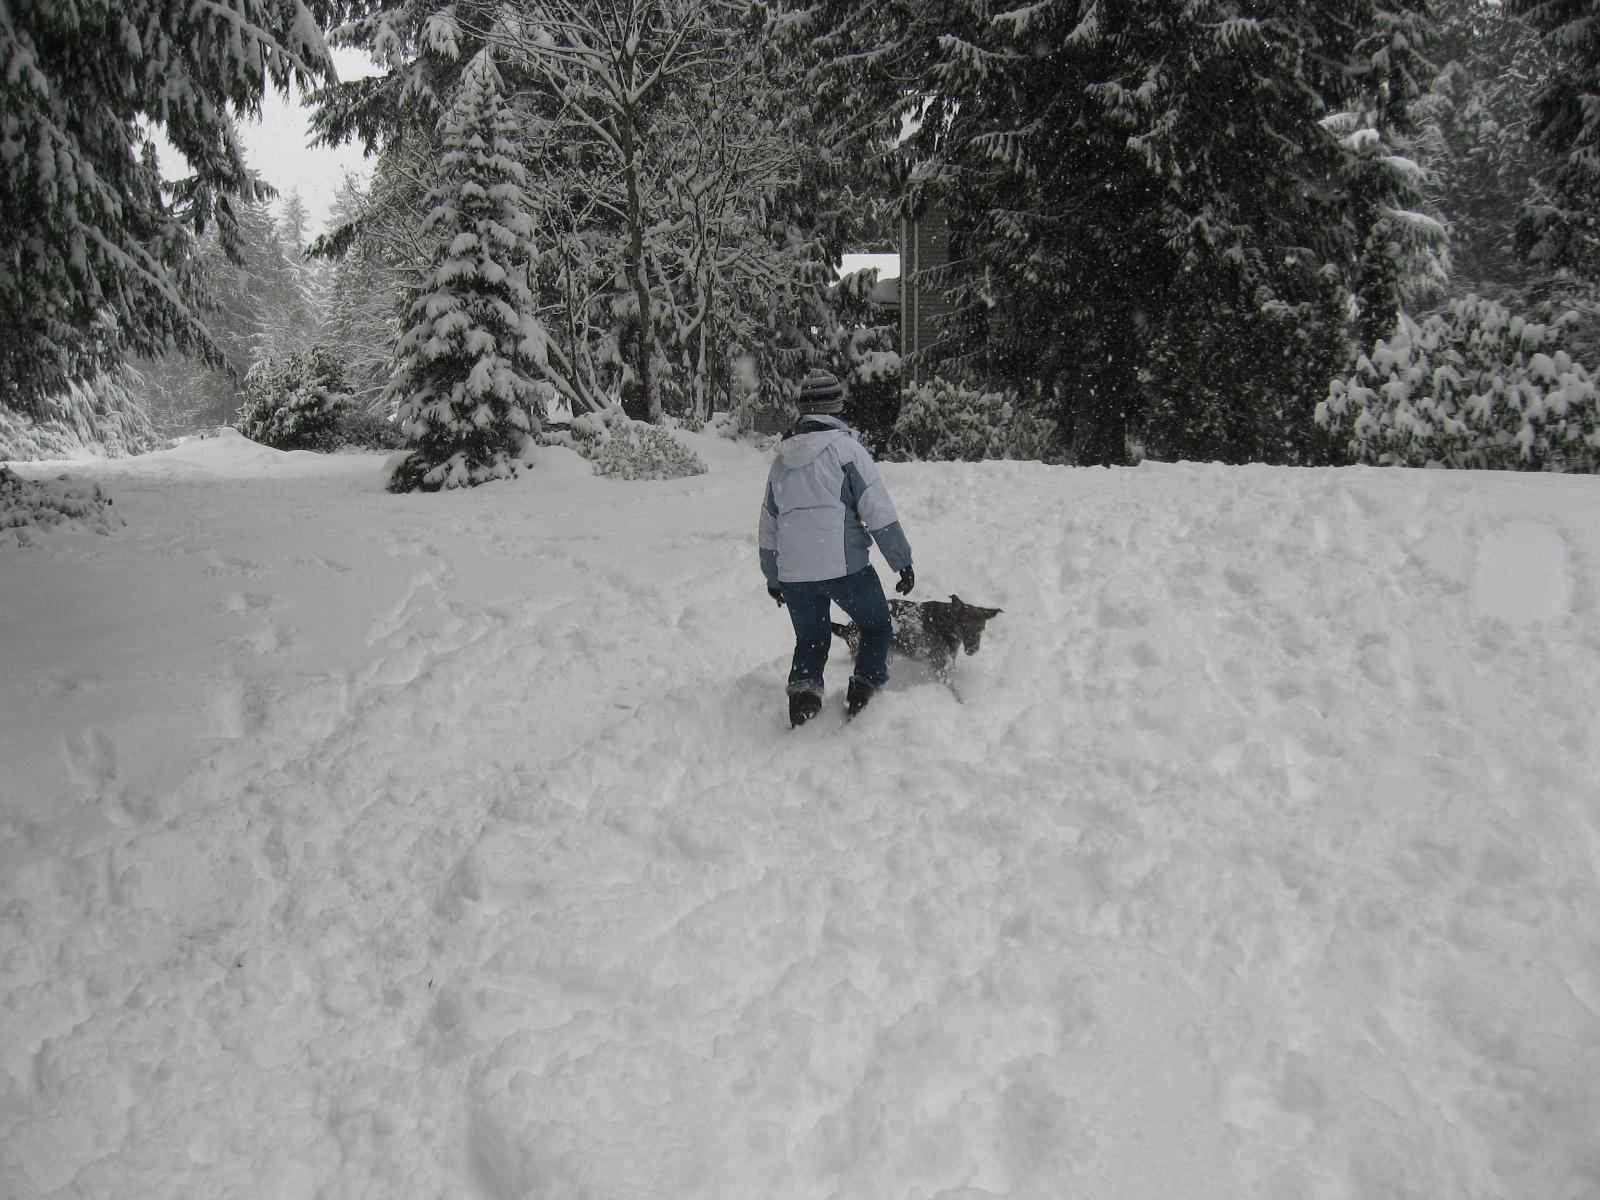 Thea & Toki in the snow in Woodinville, WA.